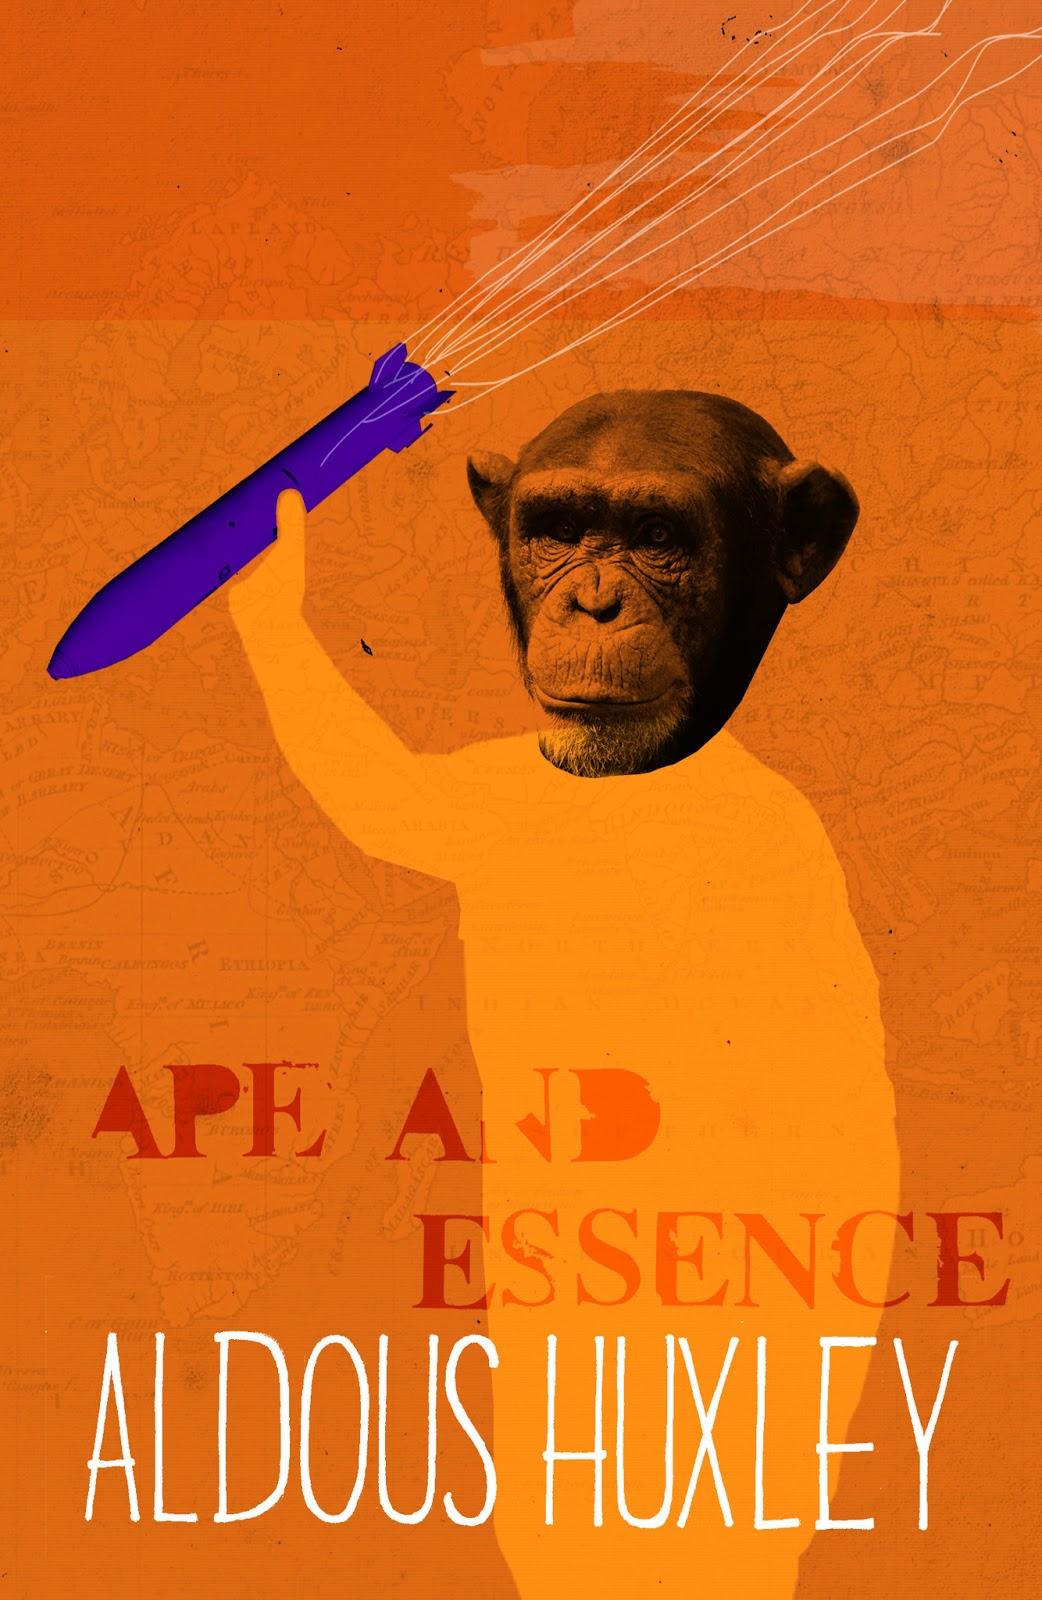 Briony Firth Illustration Aldous Huxley Ape And Essence border=